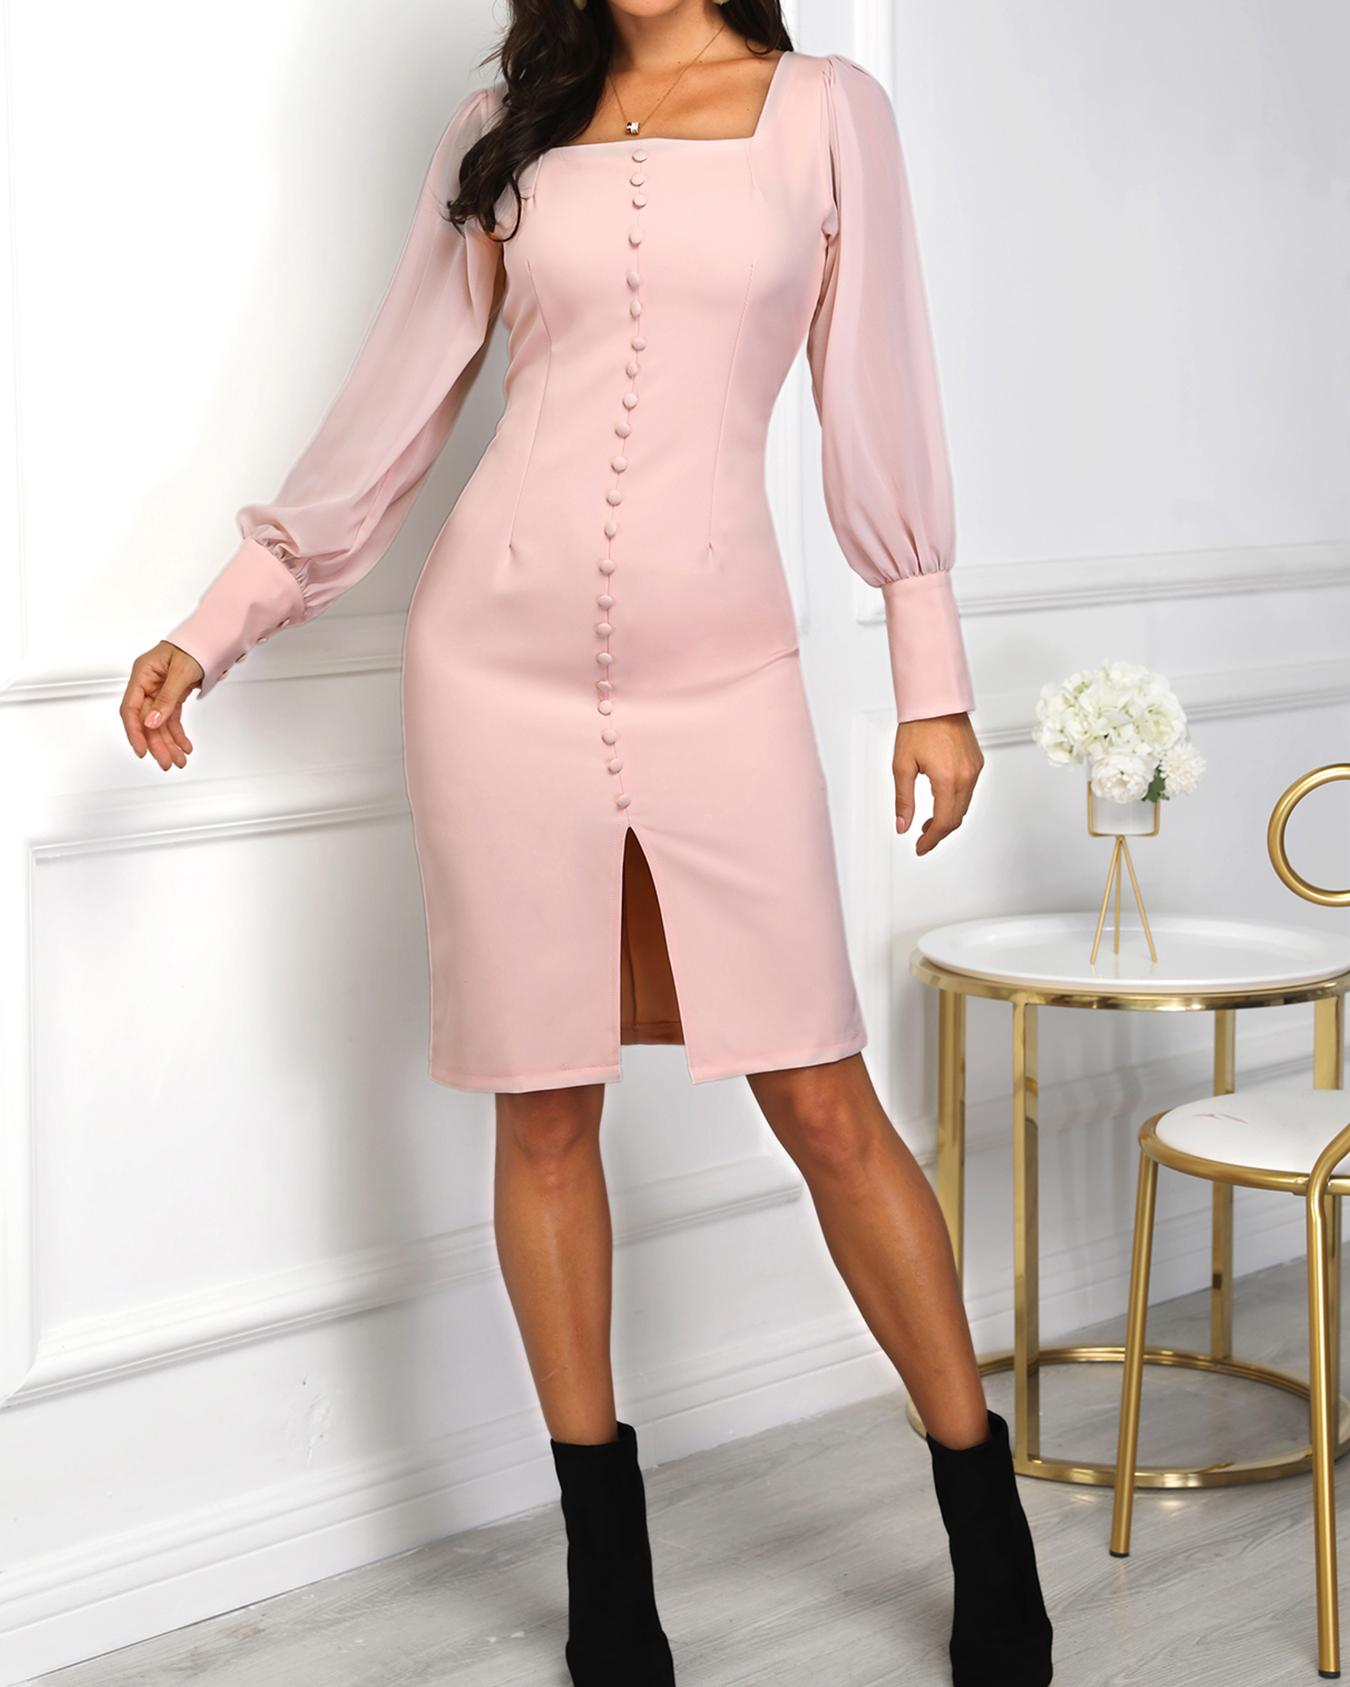 boutiquefeel / Vestido con abertura de manga de obispo de un solo pecho